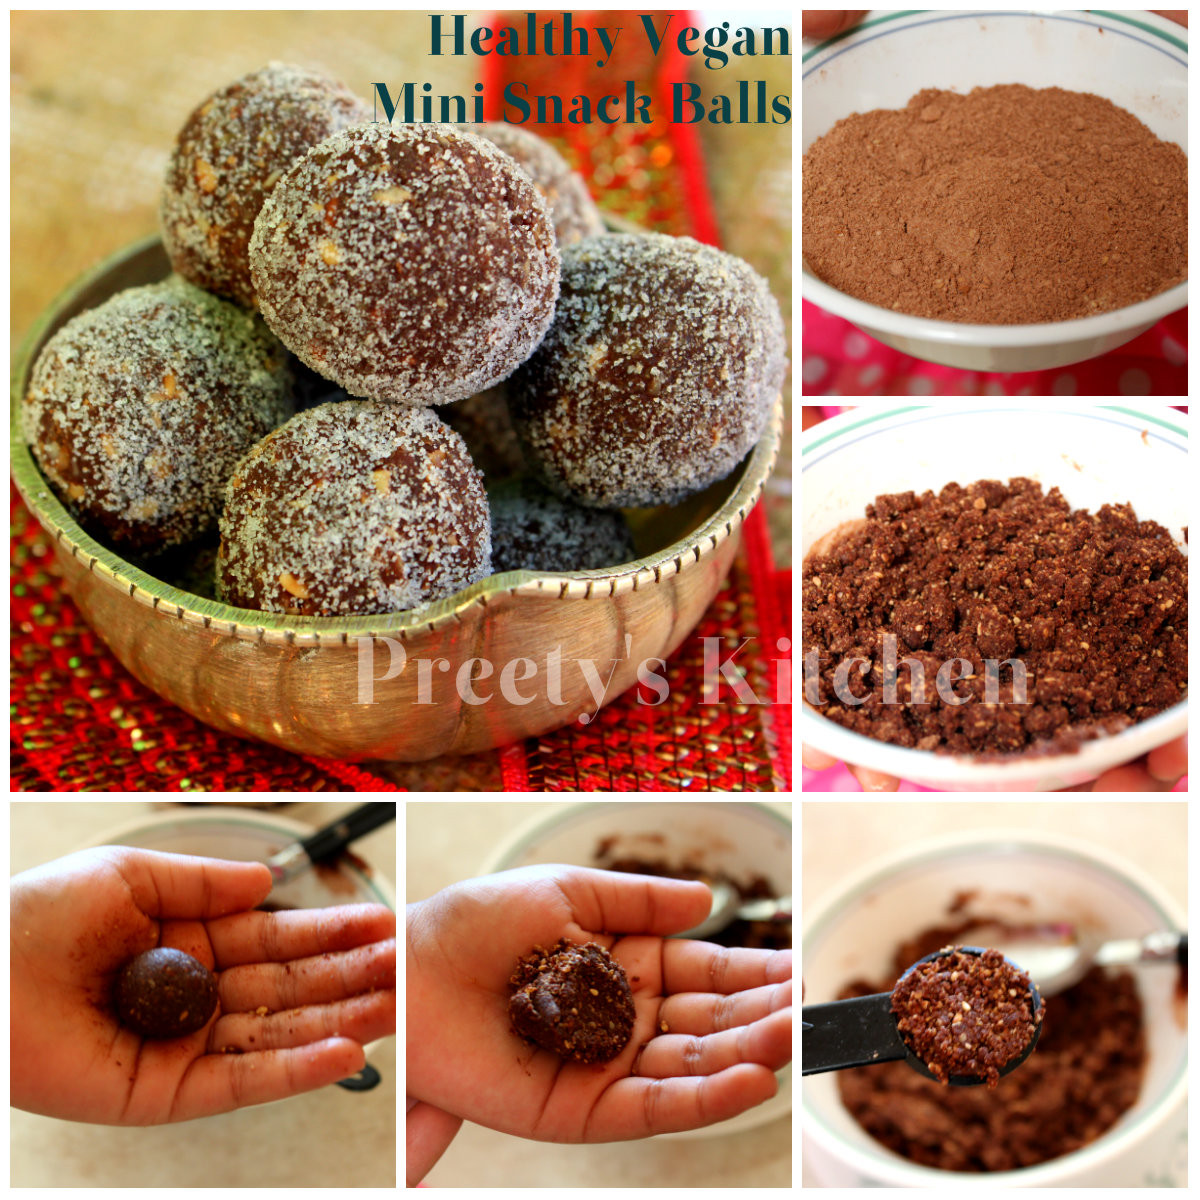 Healthy Vegan Snack Recipes  Preety s Kitchen Healthy Vegan Mini Snack Balls No Bake